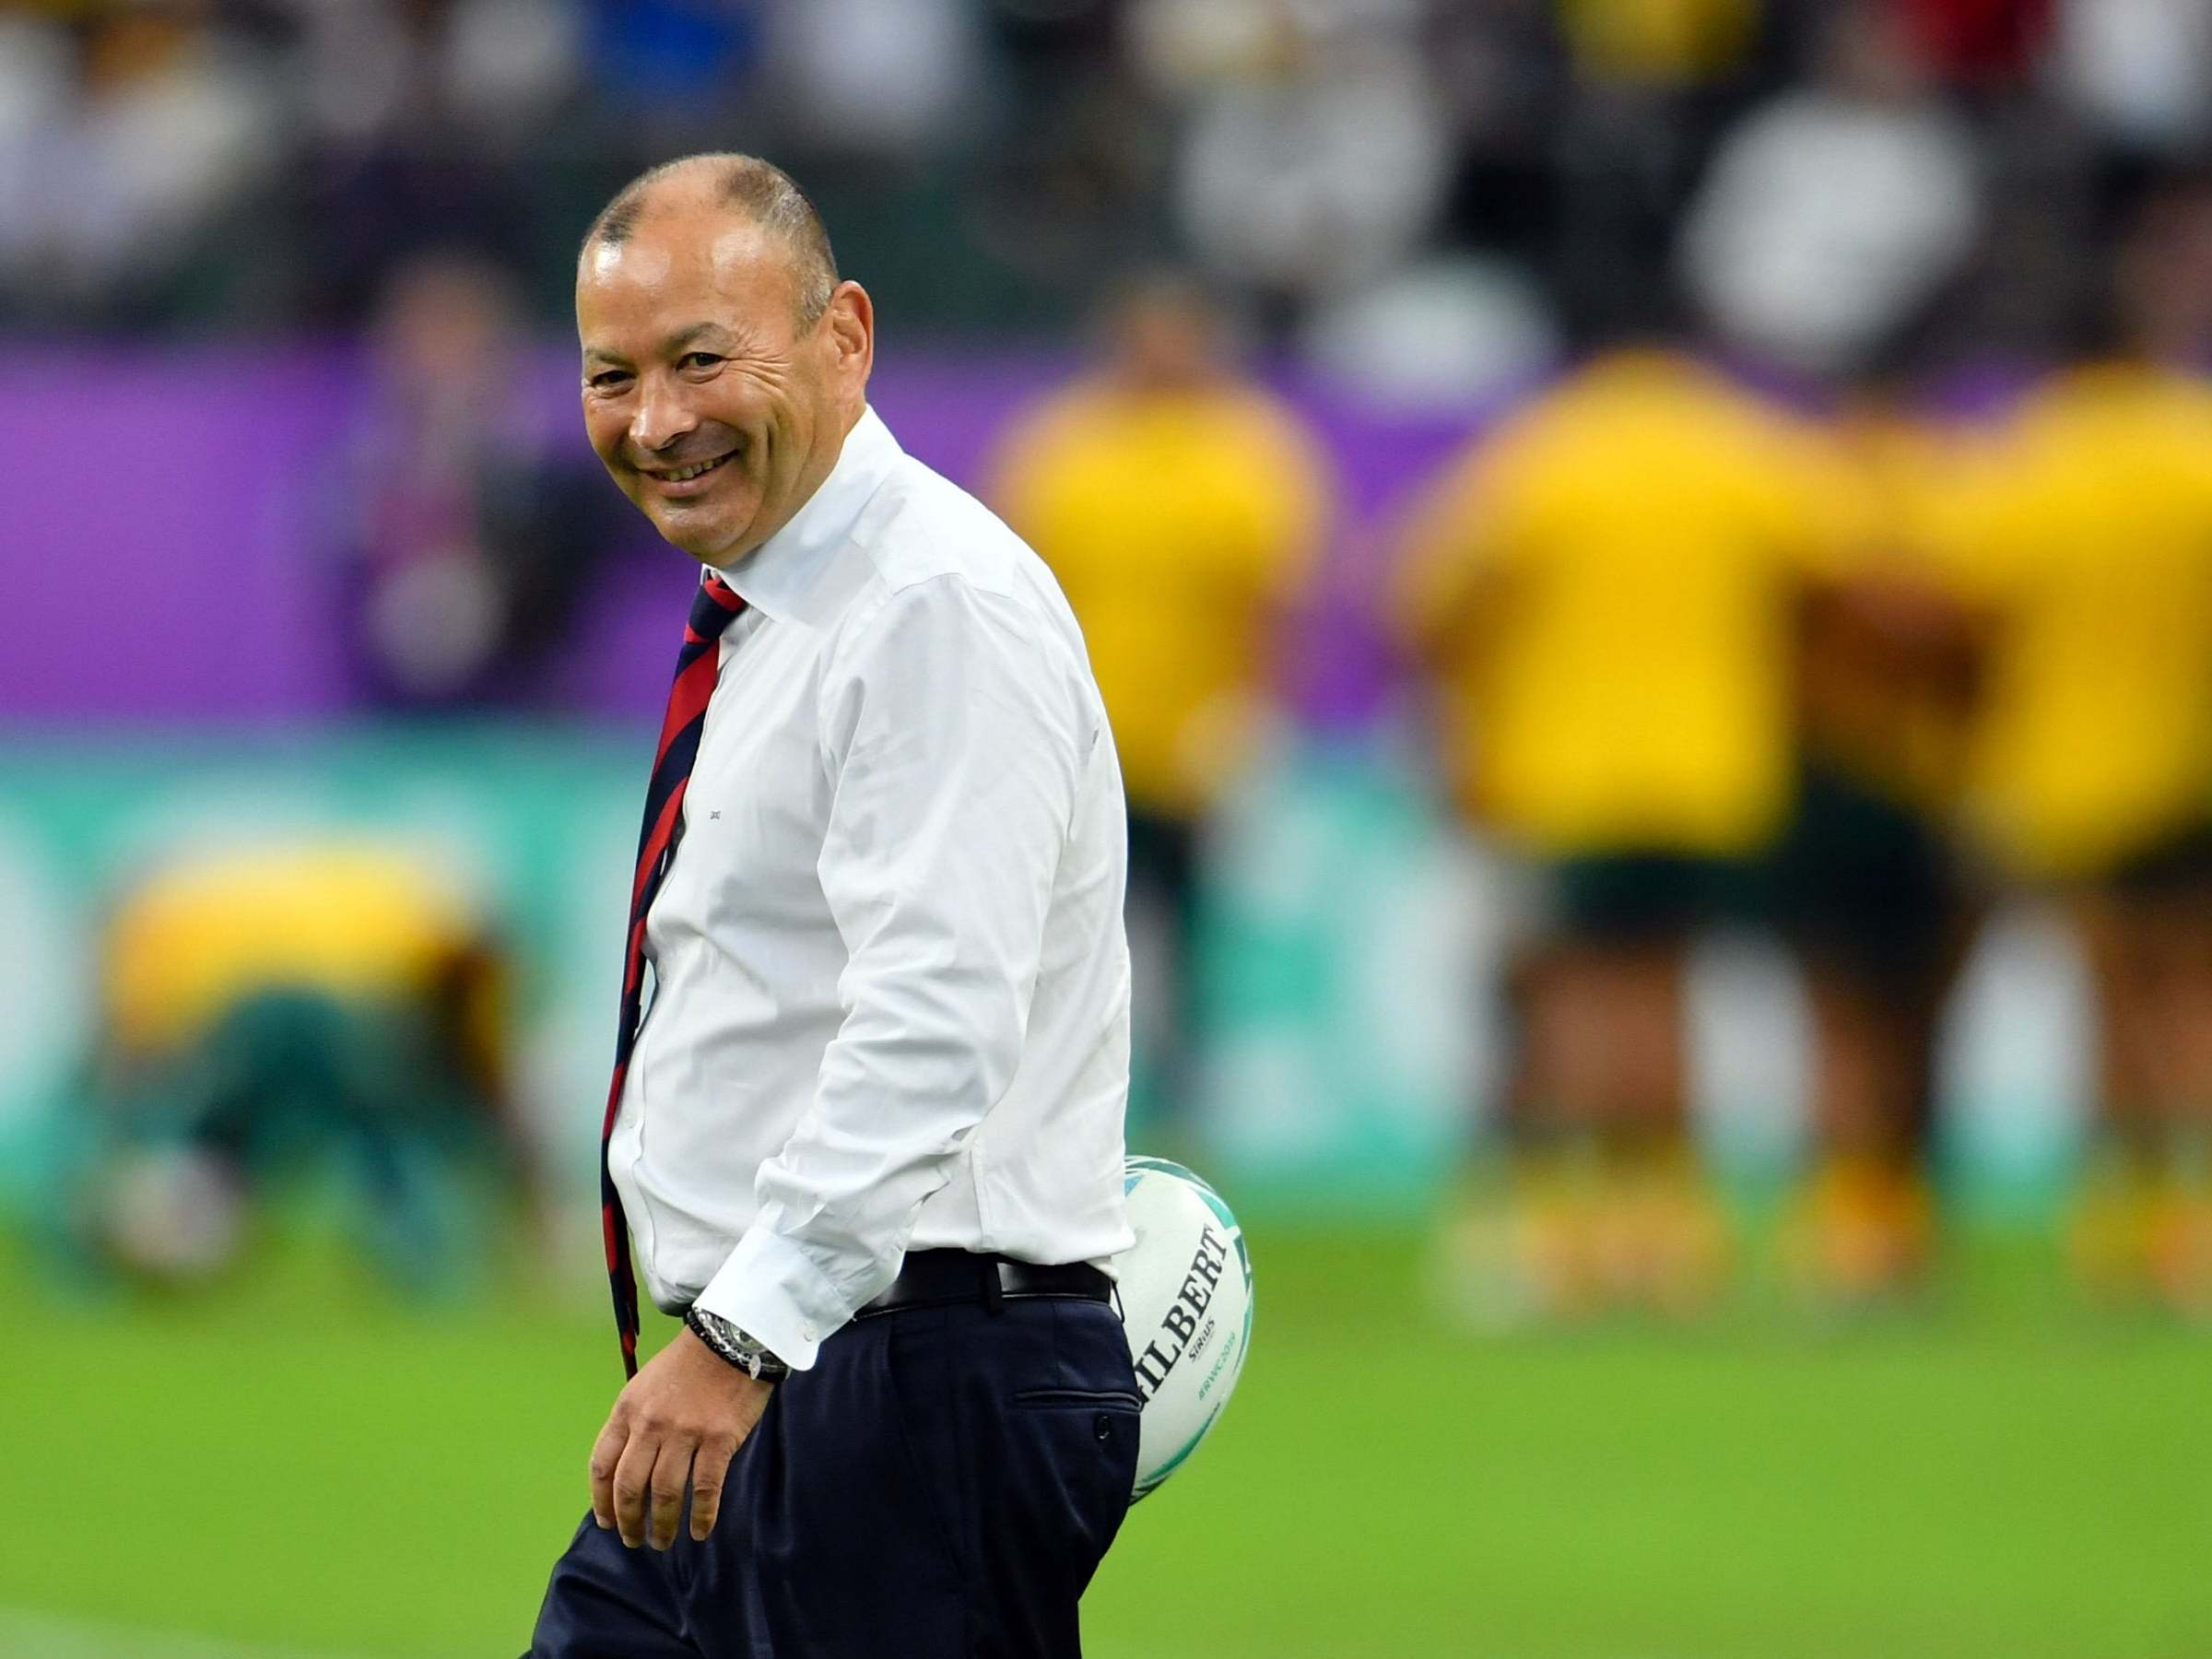 Rugby World Cup 2019: Eddie Jones warns England to prepare for New Zealand 'samurais' in semi-finals